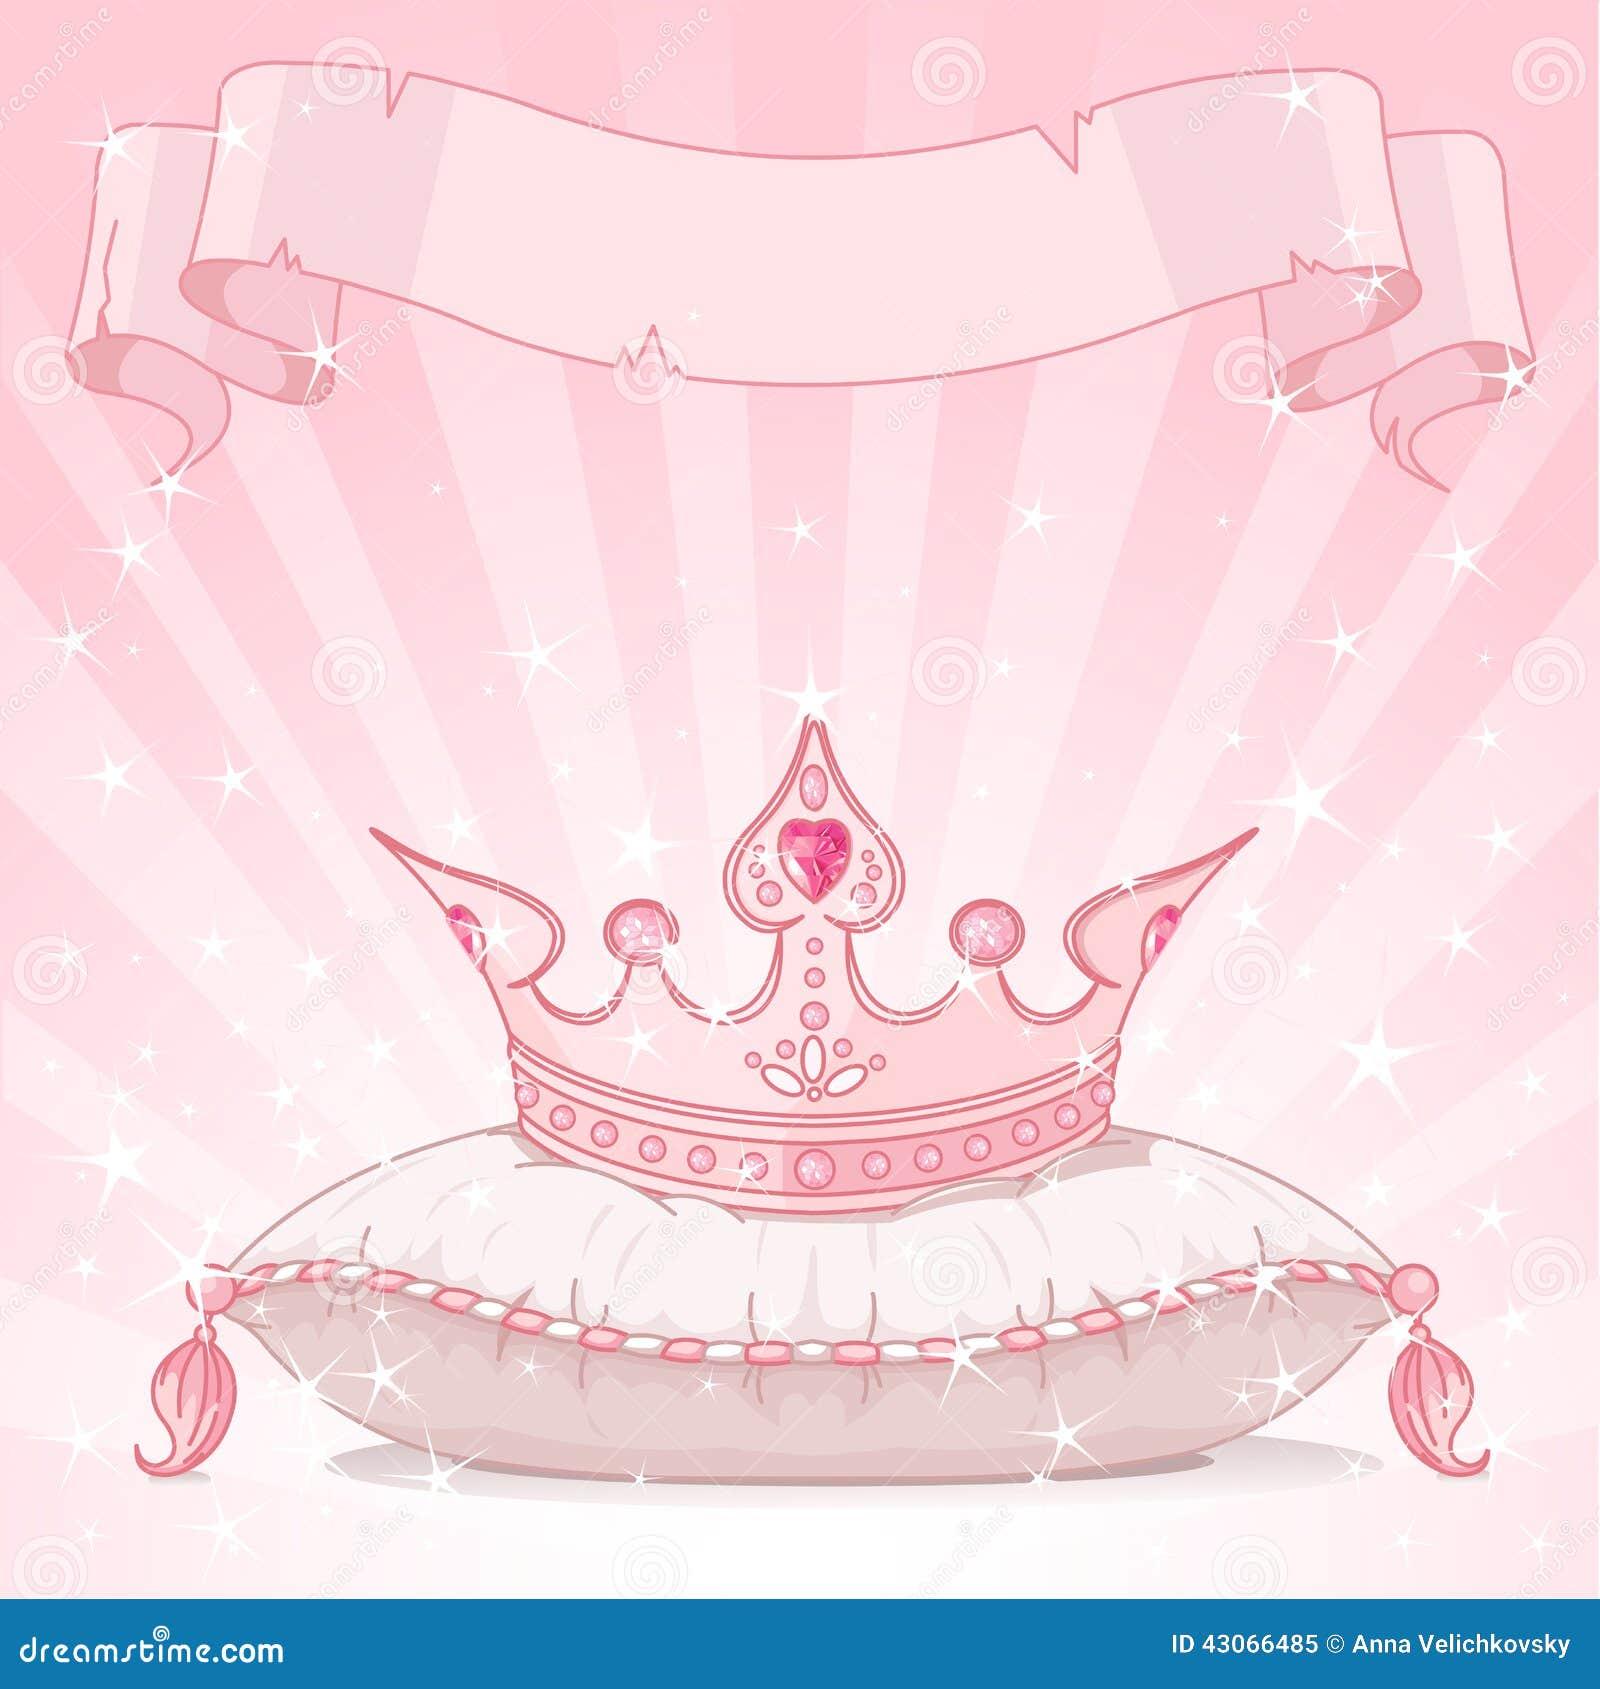 Cinderella Party Invitation with luxury invitation template